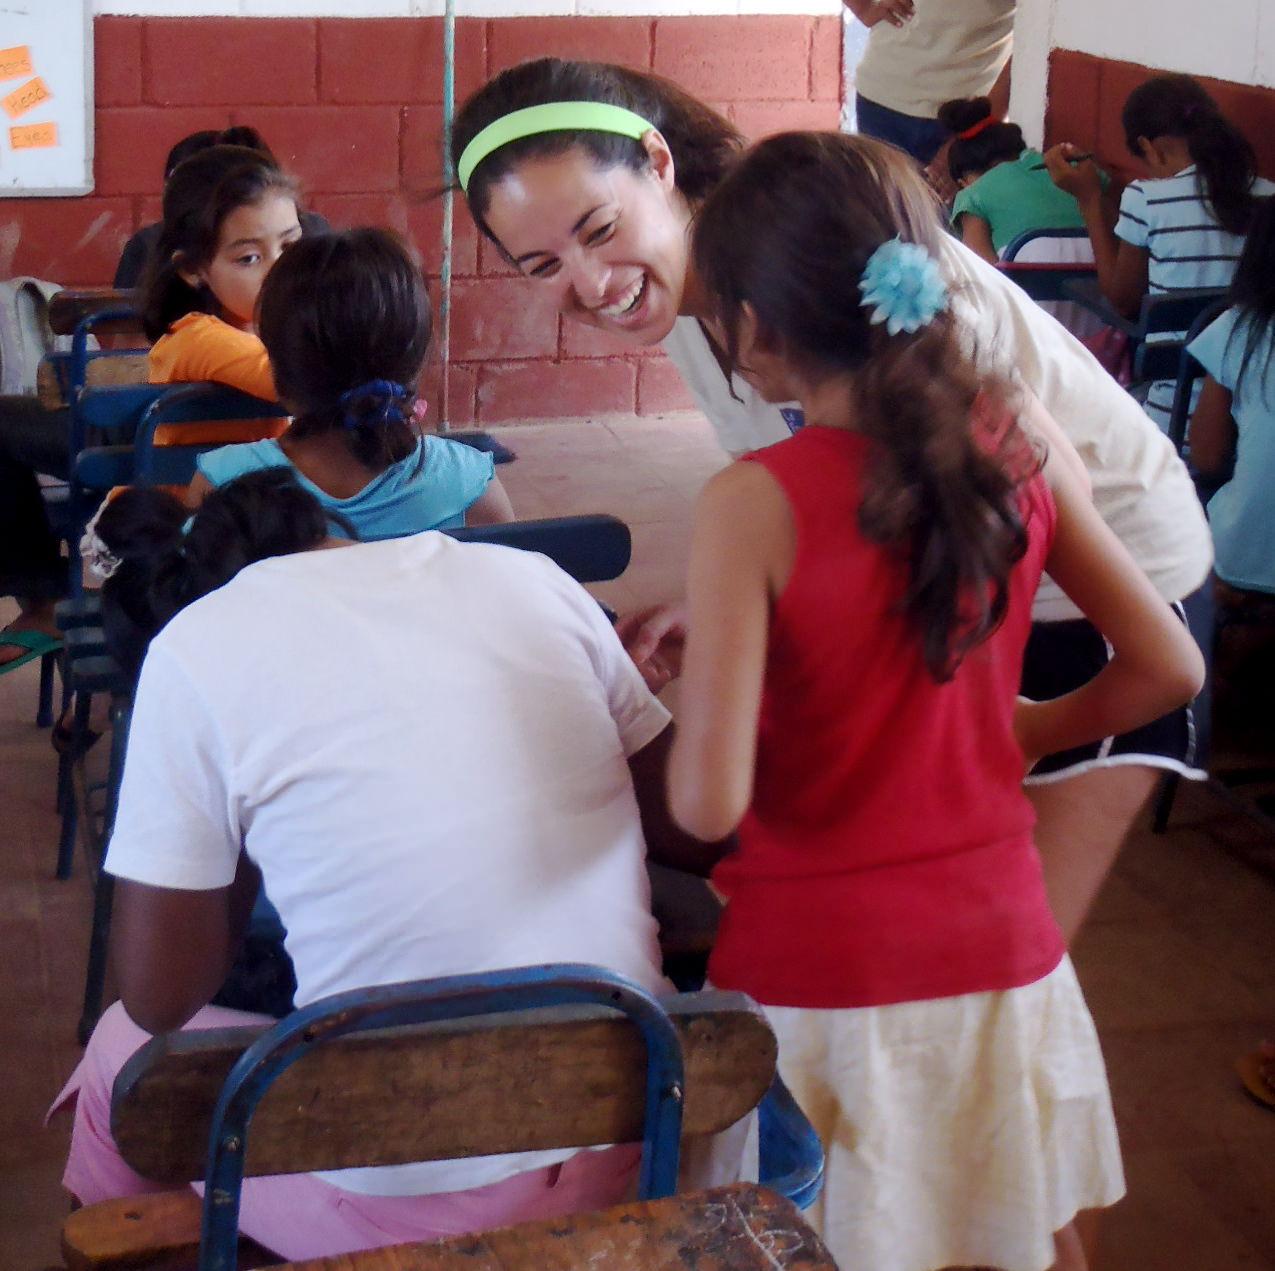 Teaching some Nica chicas.